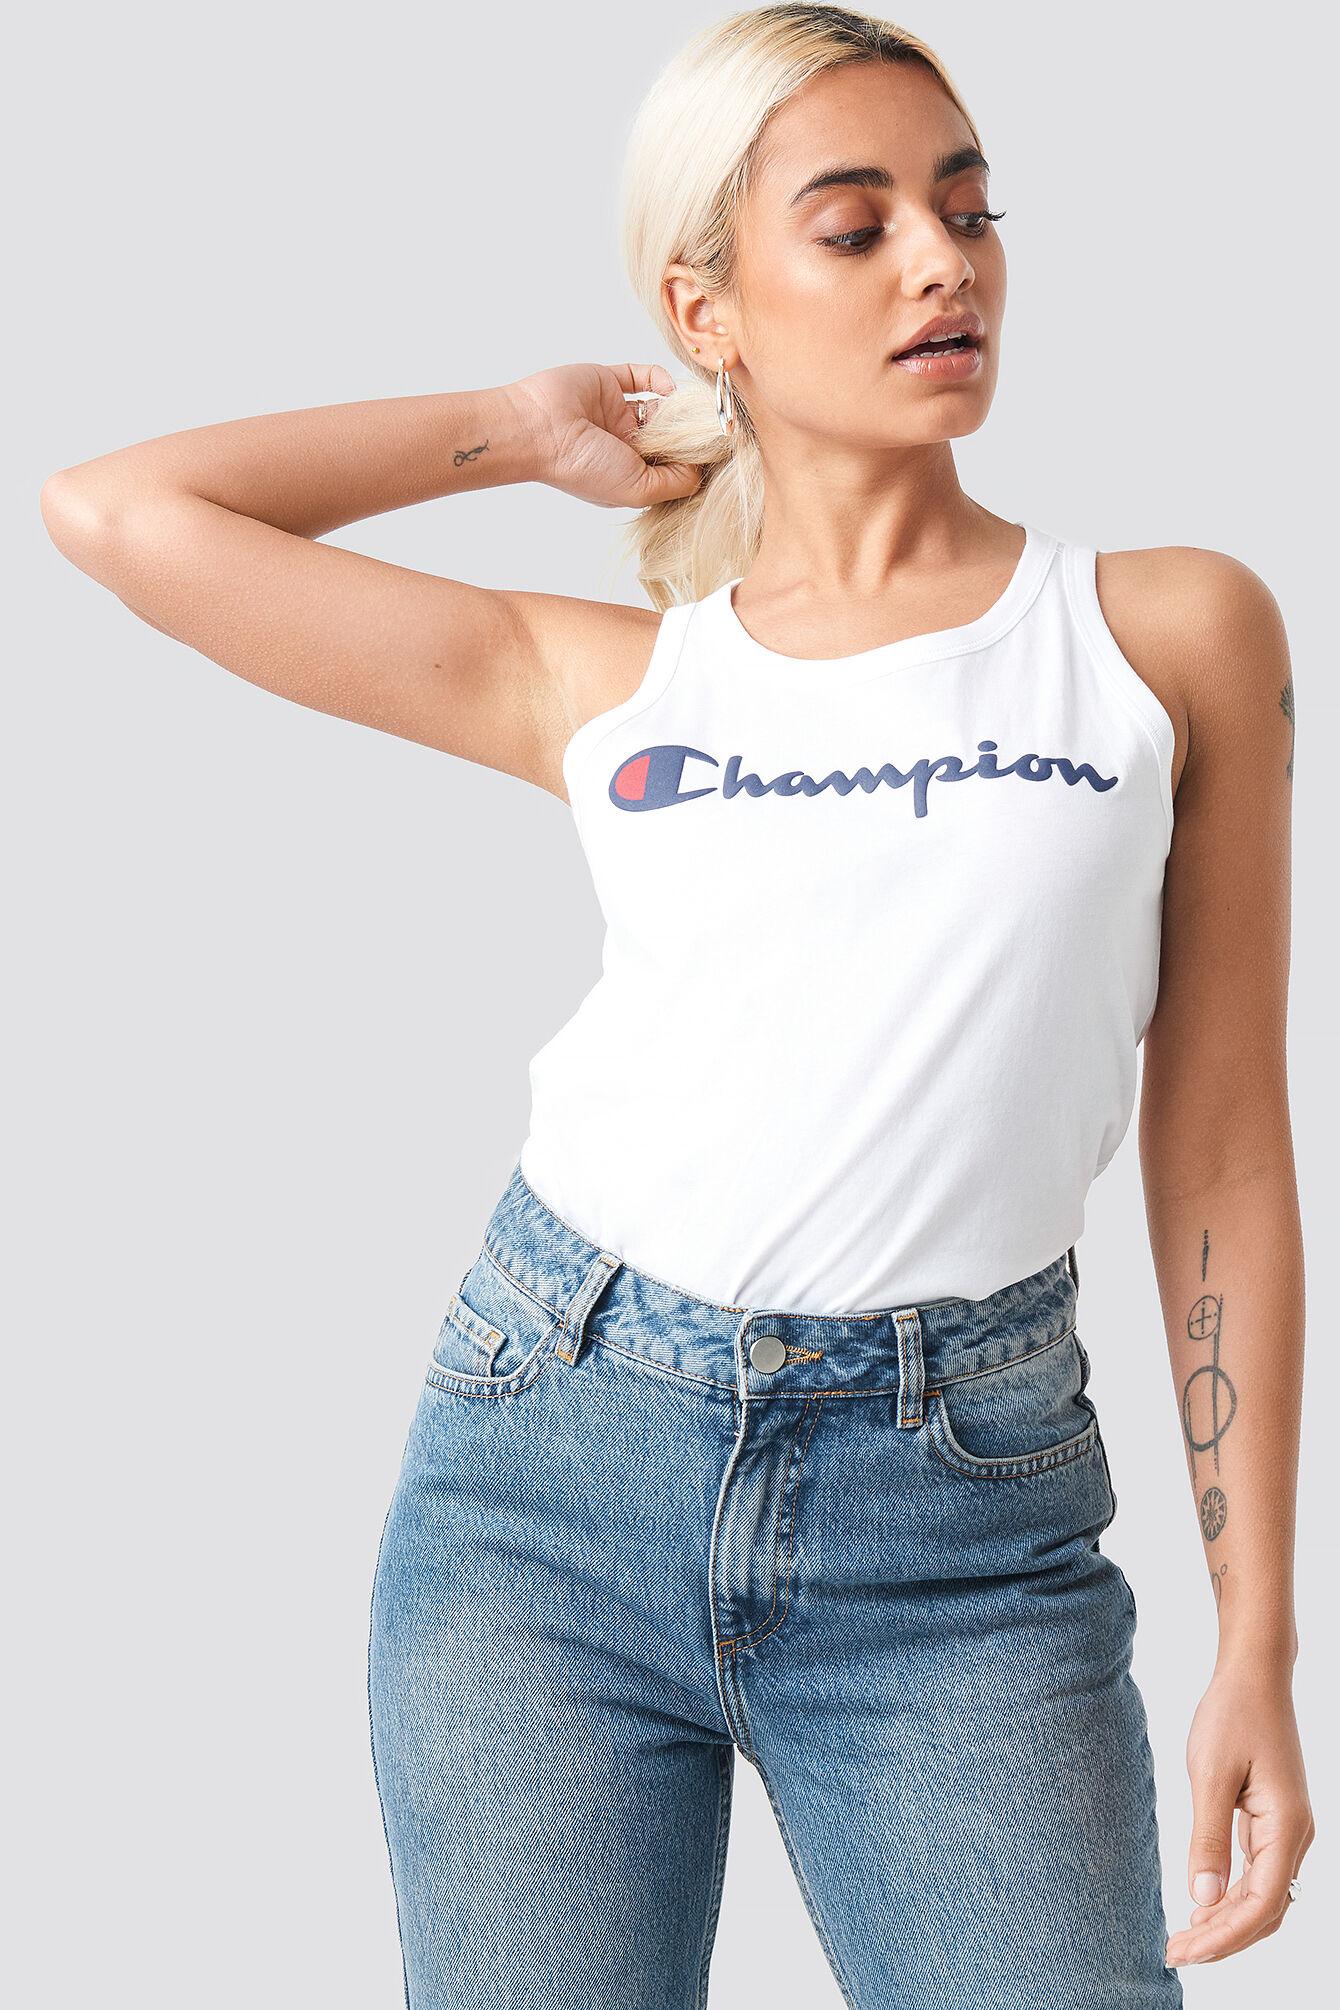 Champion Tank Logo Top - White  - Size: Small